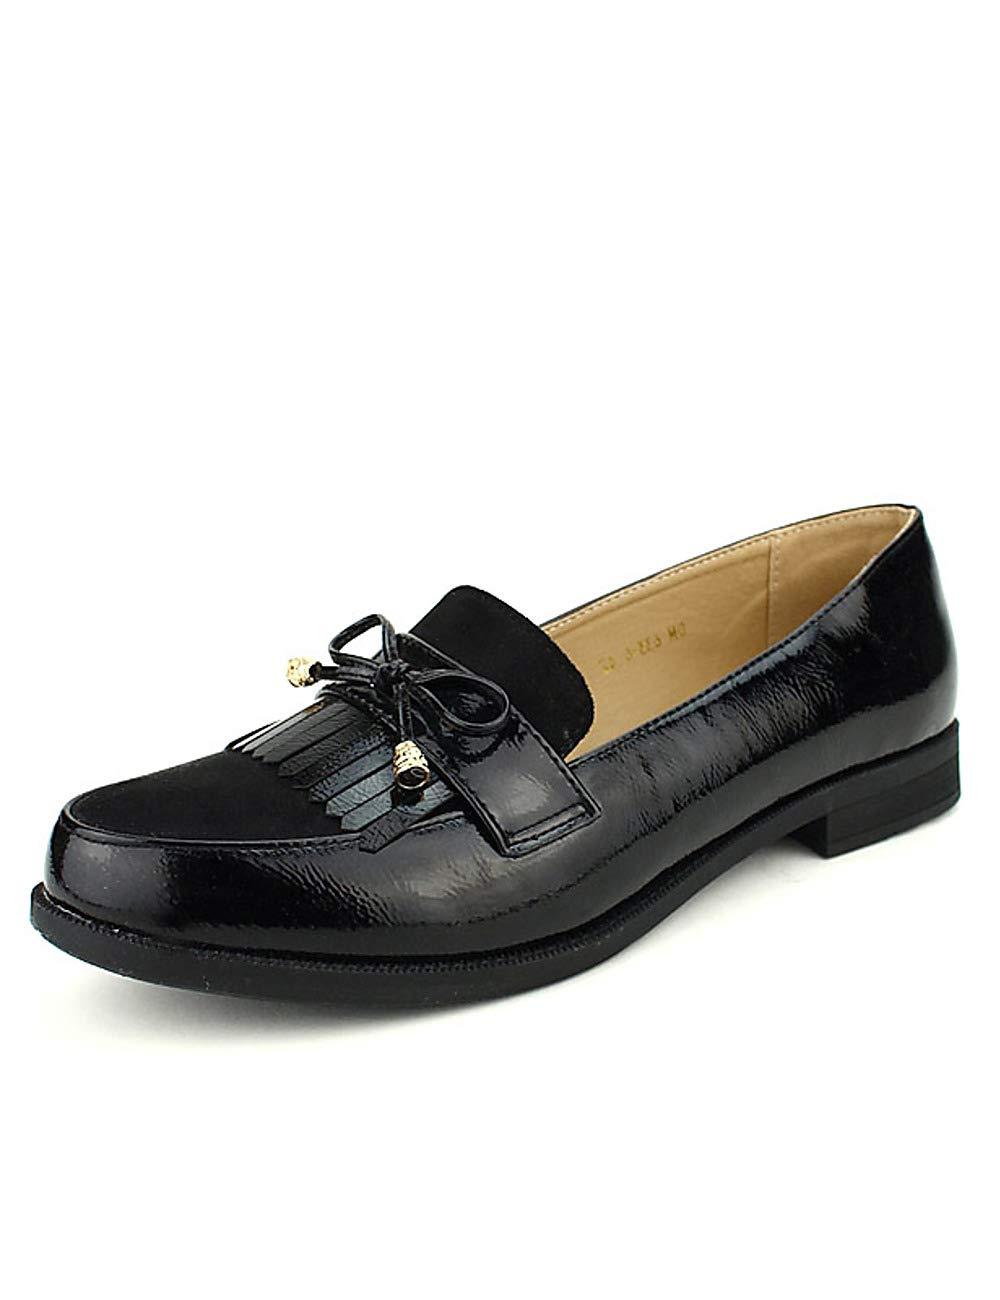 Cendriyon, 16924 Derbies Pointure Noires CINKS Grande Pointure Chaussures Femme Derbies Noir bca8091 - latesttechnology.space